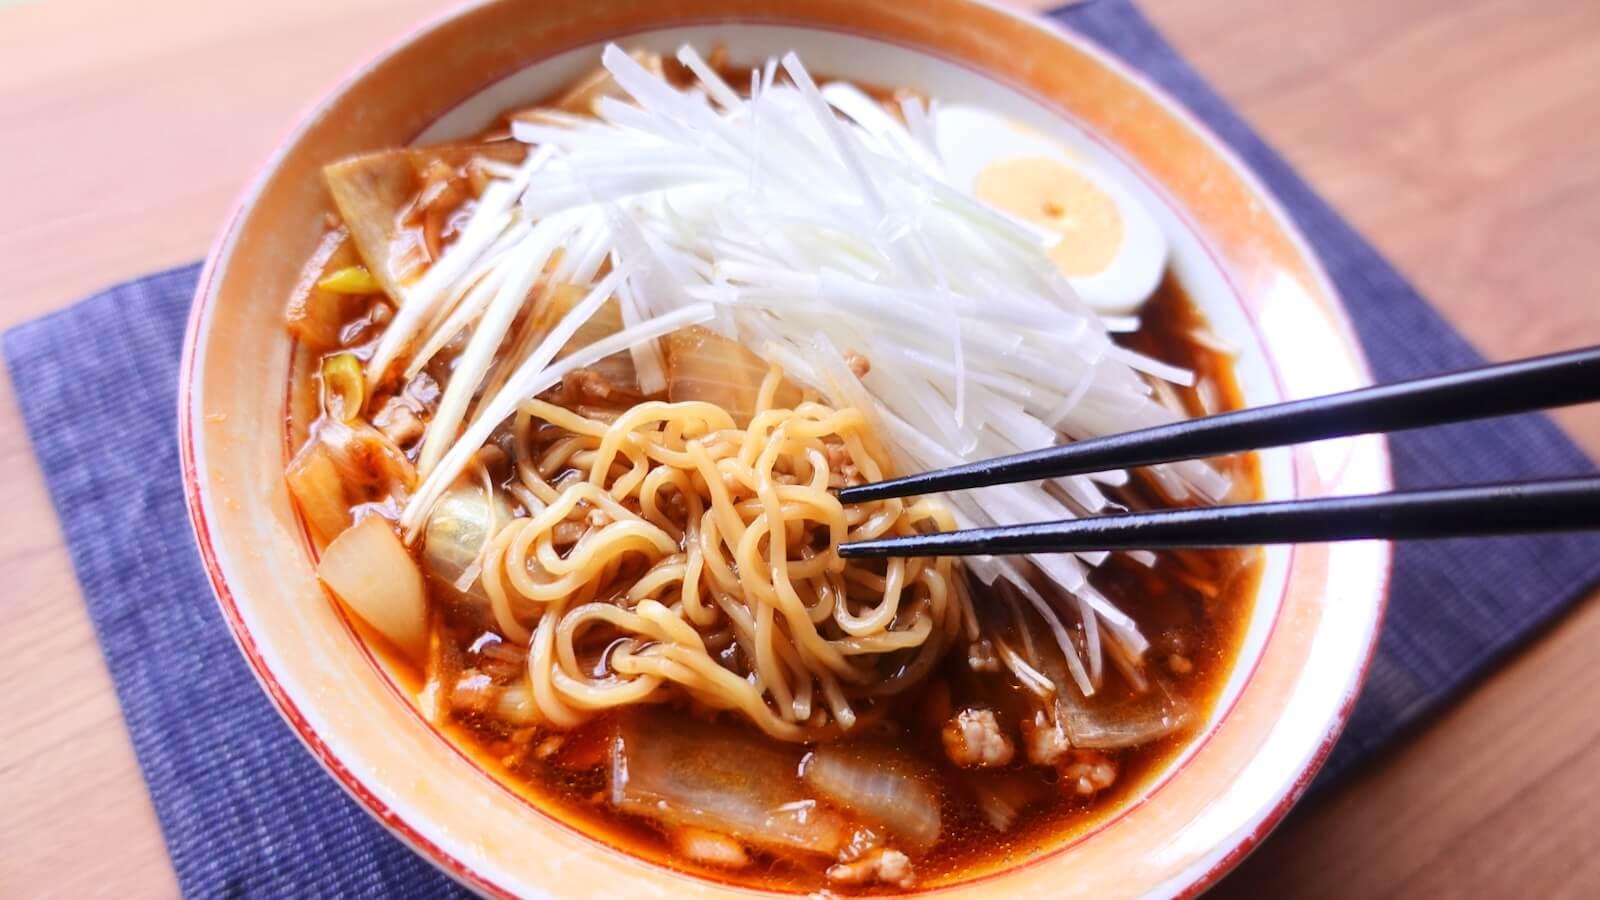 Photograph of the made Ezawa Katsuura Tantan noodles taken from an angle